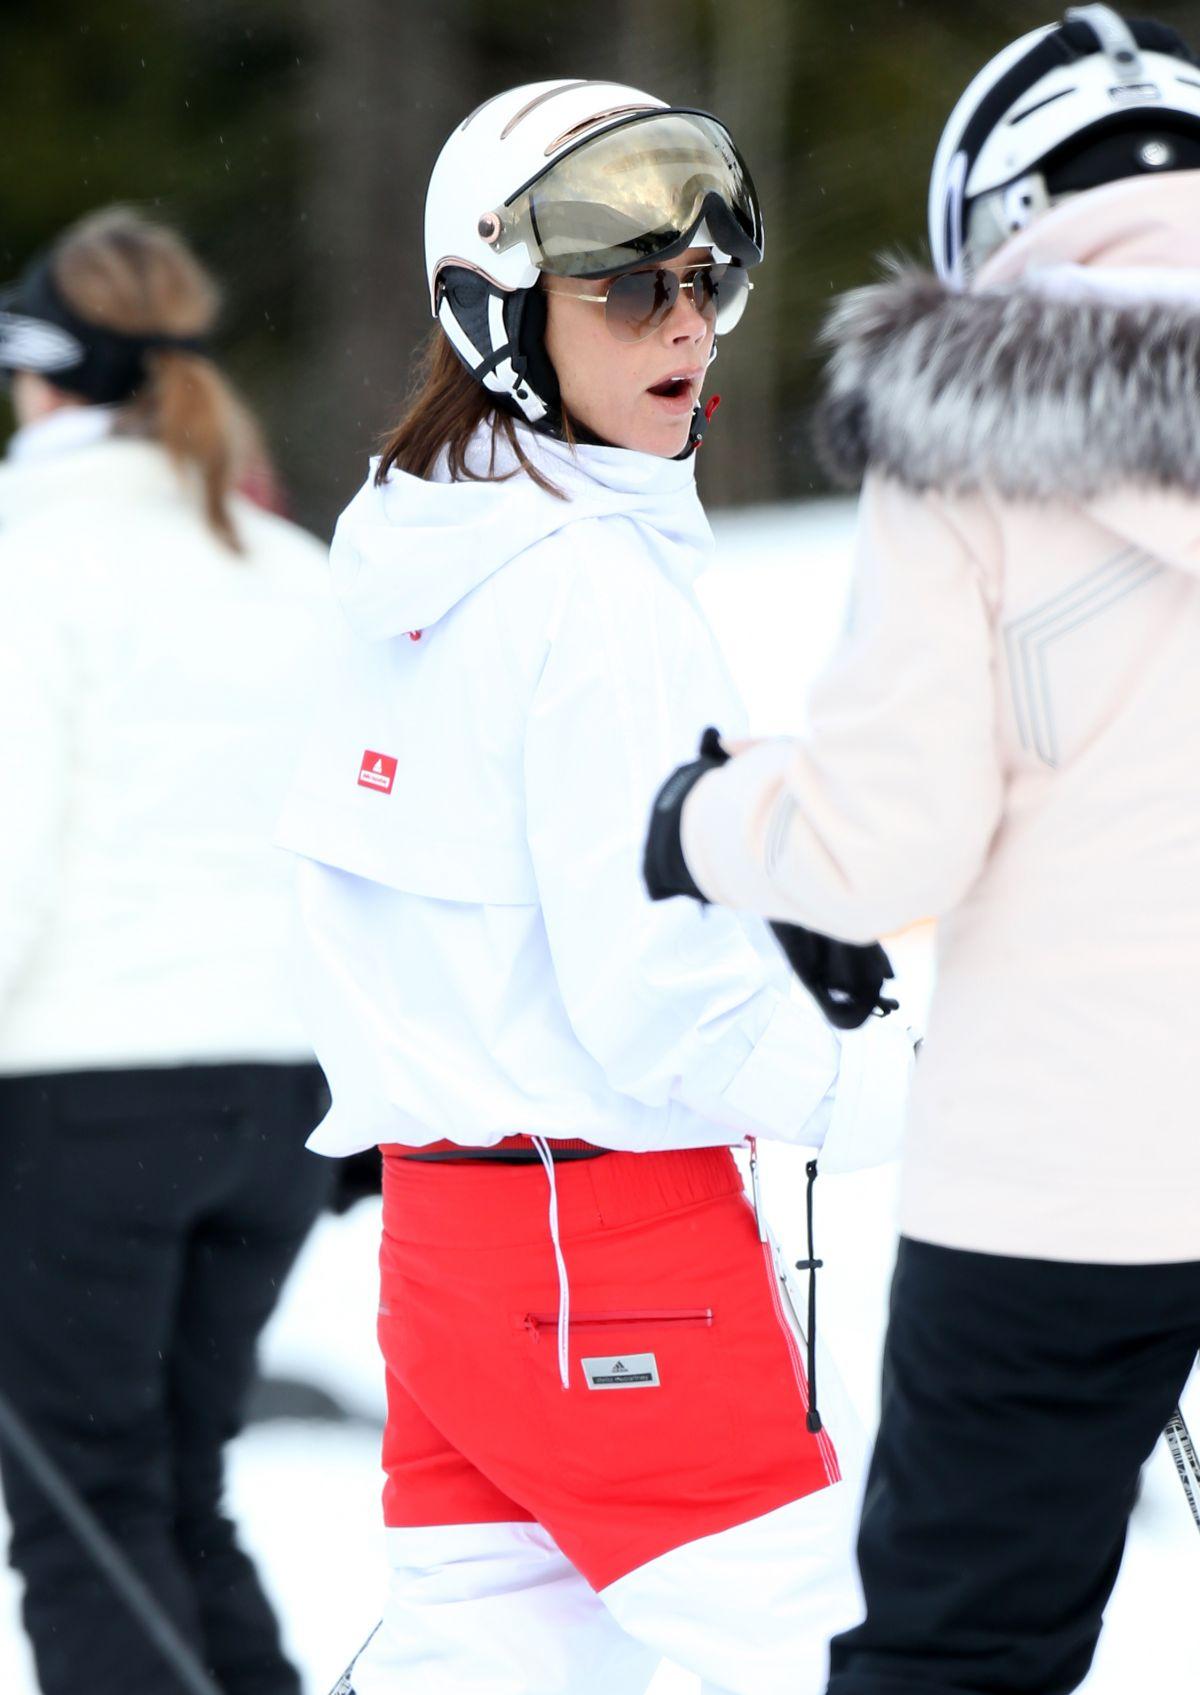 b72b965bfd5b5 Shistler Hawtcelebs Skiing In Beckham 02172017 Victoria qnz1FRz